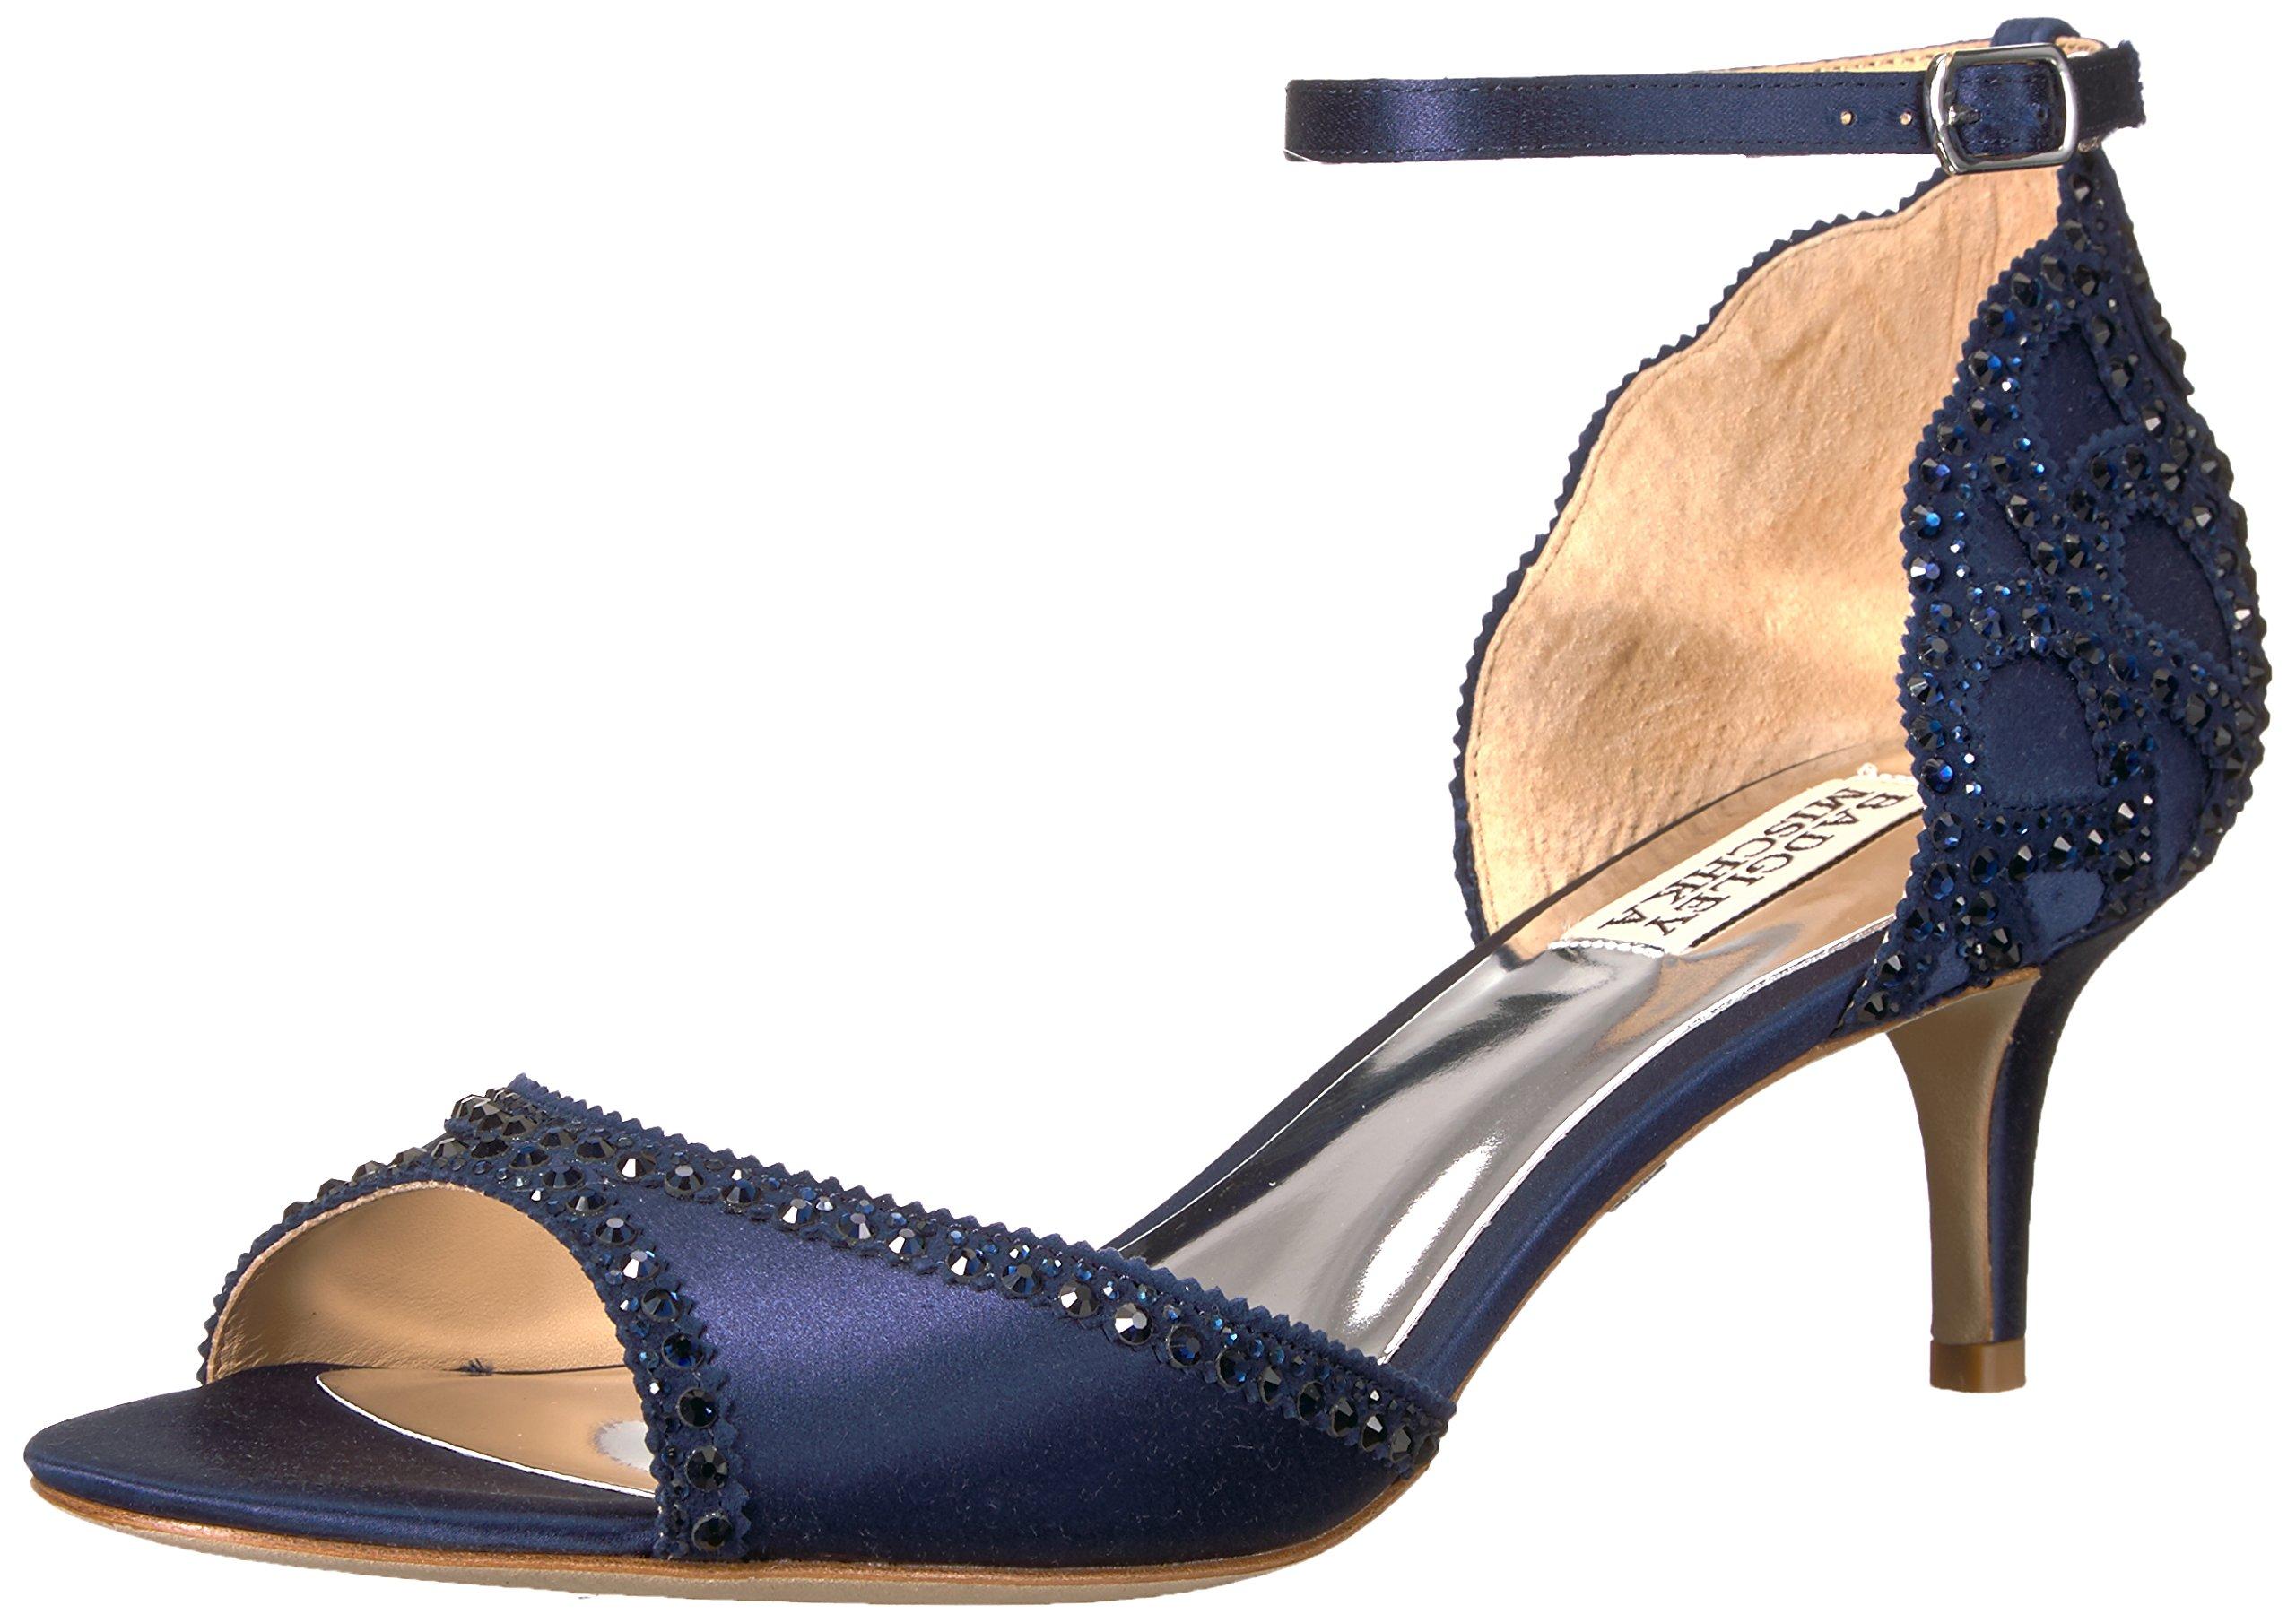 Badgley Mischka Women's Gillian Heeled Sandal, Midnight, 8.5 M US